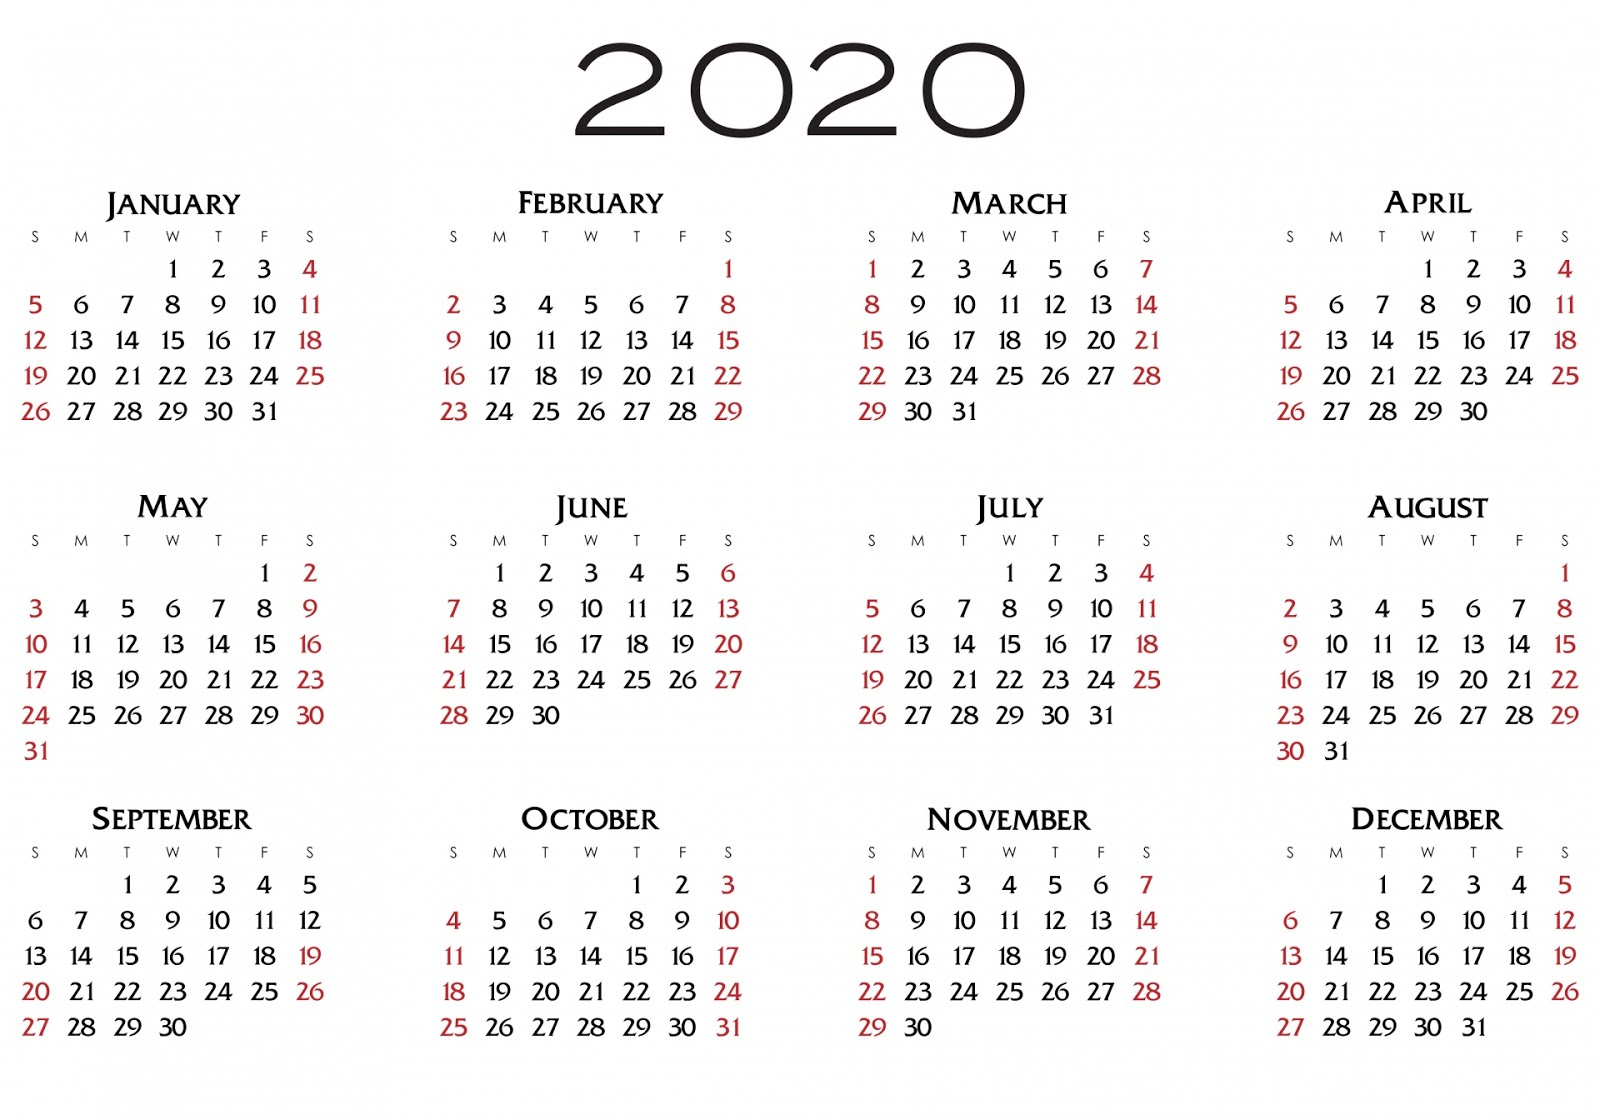 2020 printable calendar pdf | calendars - kalendar ...